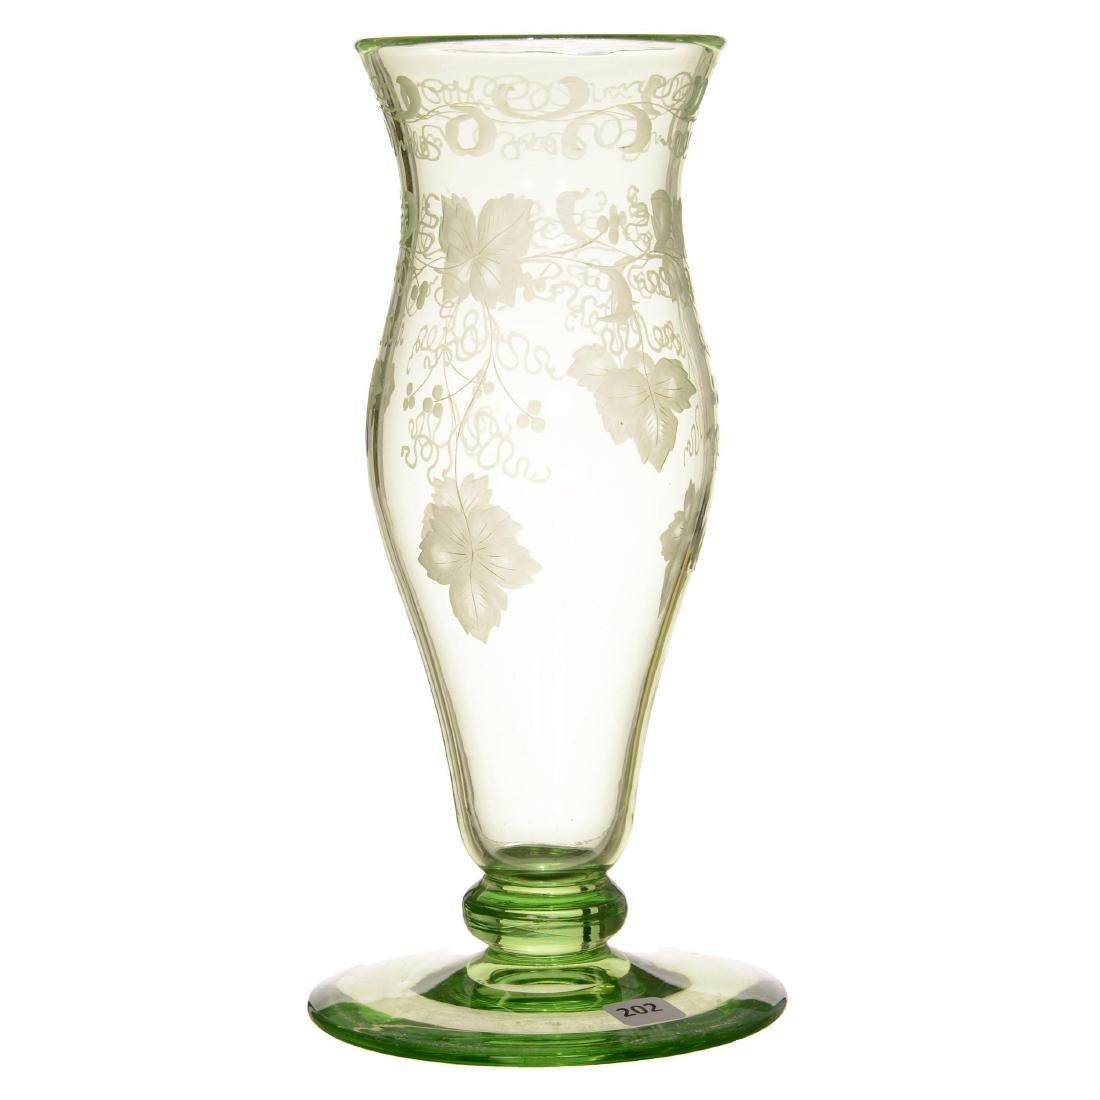 Solid Apple Green Pedestal Vase - ABCG